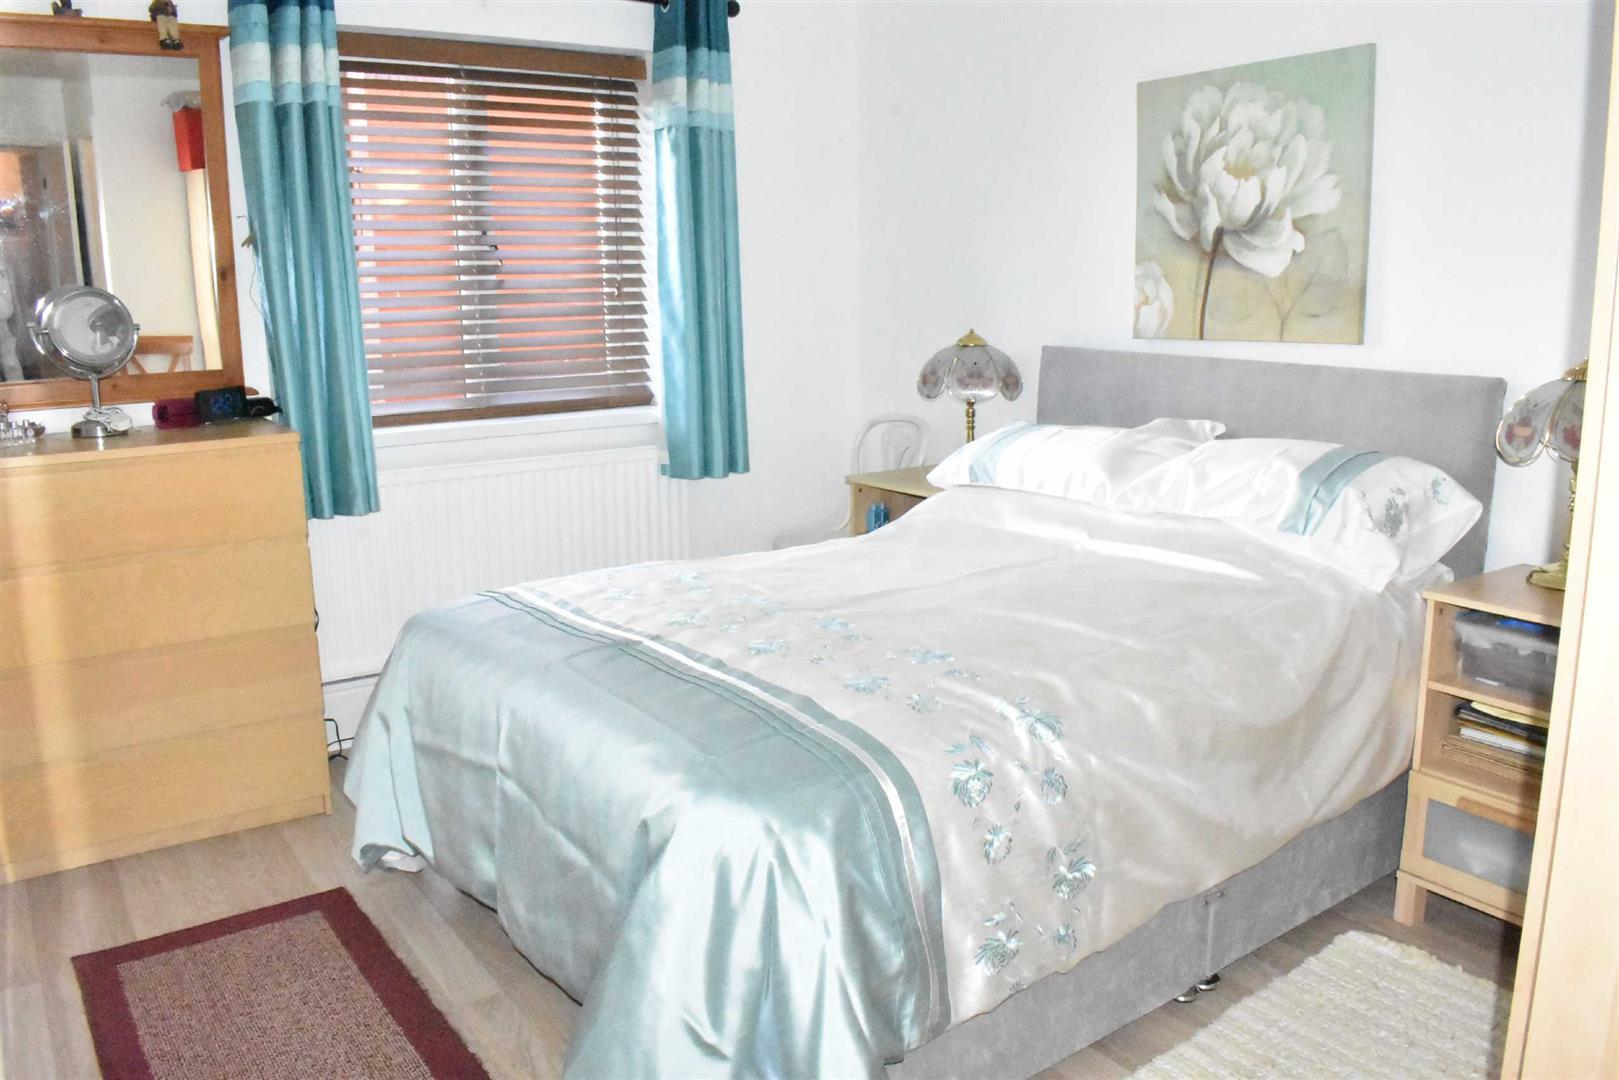 Sarlou Court, Uplands, Swansea, SA2 0LW